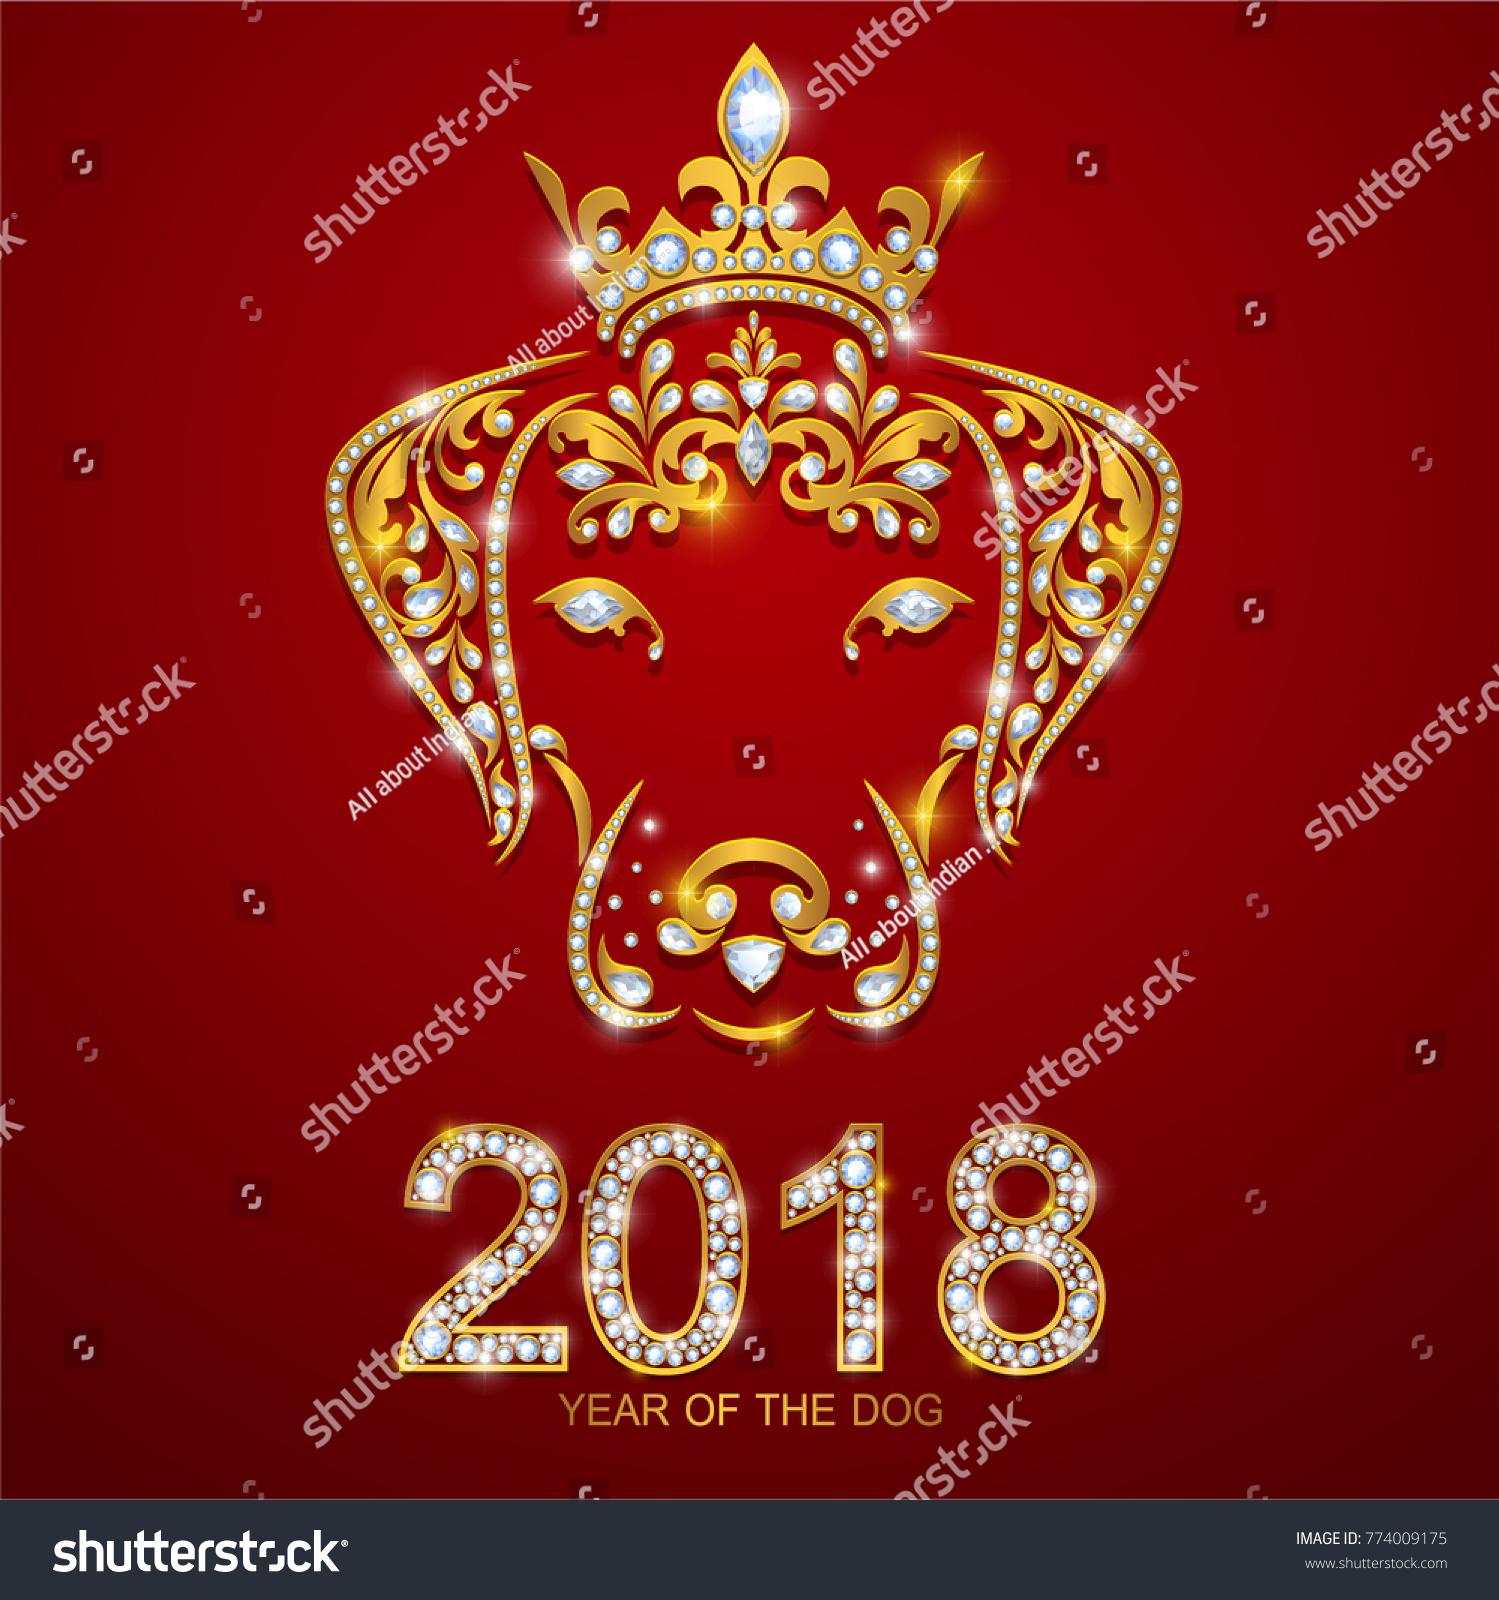 Dog year chinese zodiac symbol new stock vector 774009175 dog of the year chinese zodiac symbol new year 2018 with gold patterned and crystals buycottarizona Images